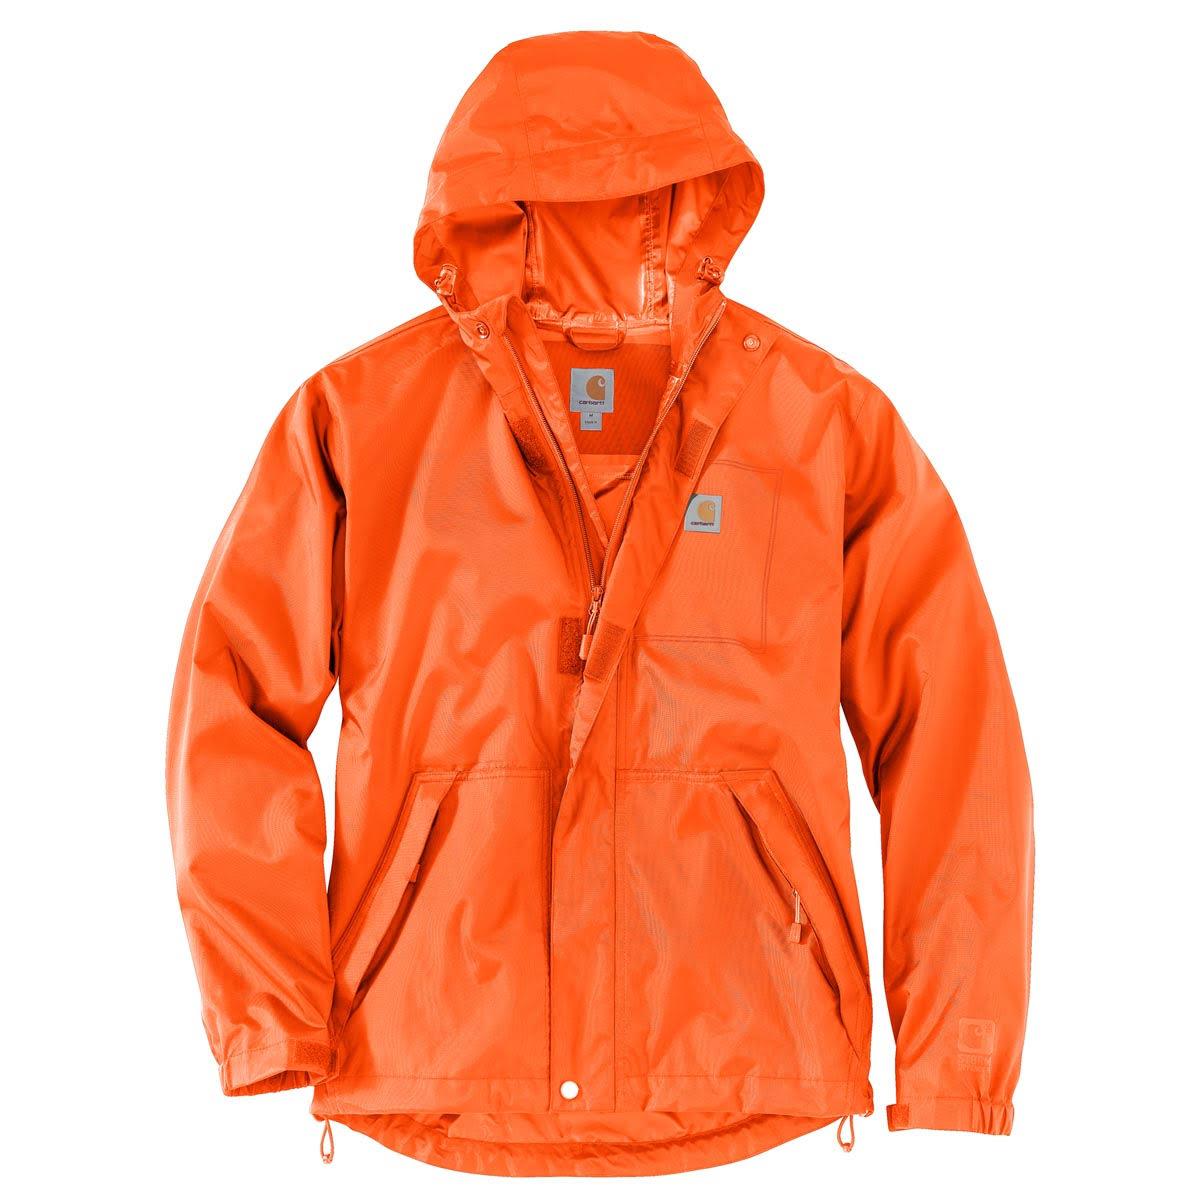 Regular Medium Carhartt Orange Jacket Harbor Mens Dry Bold 103510 cWnPcOg